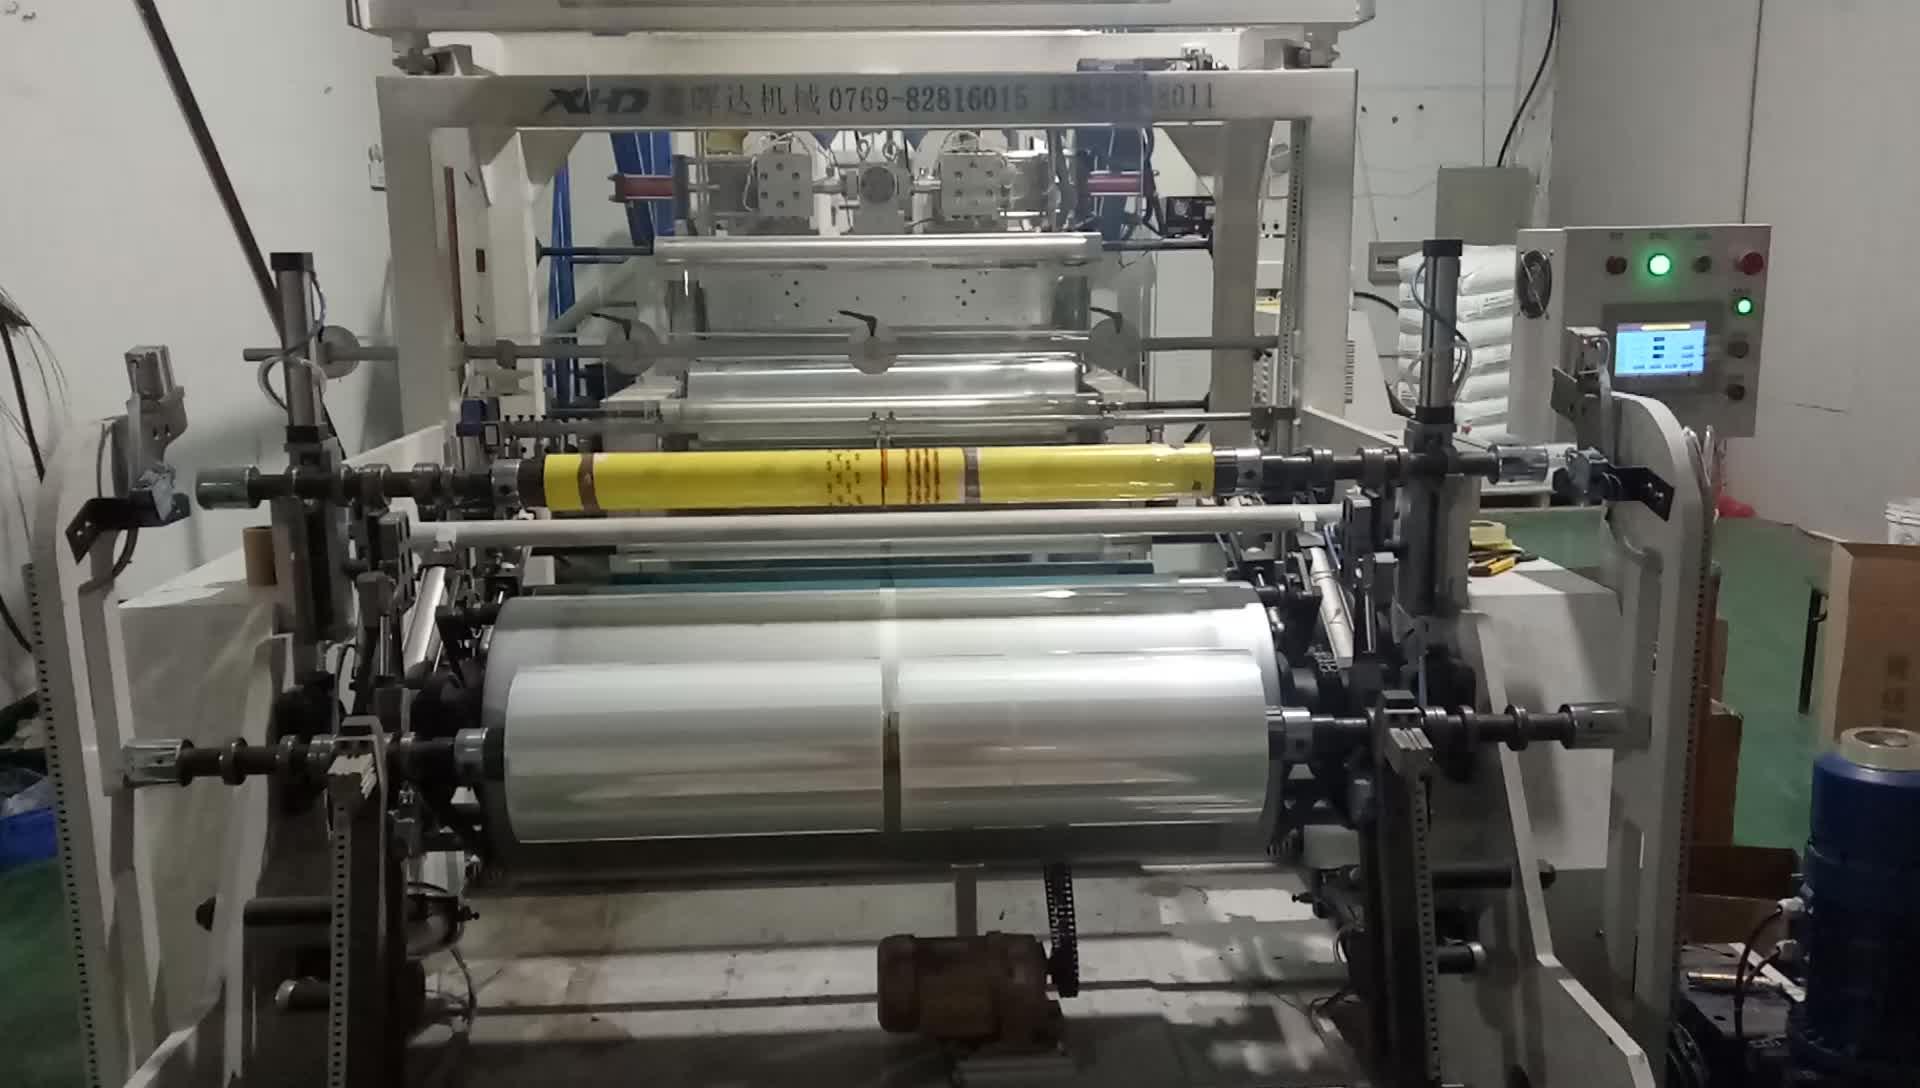 Changzhou Junwang Hotsale 2 kg, 3 kg, 4 kg, 5 kg/rolle LLDPE stretch film für paletten verpackung